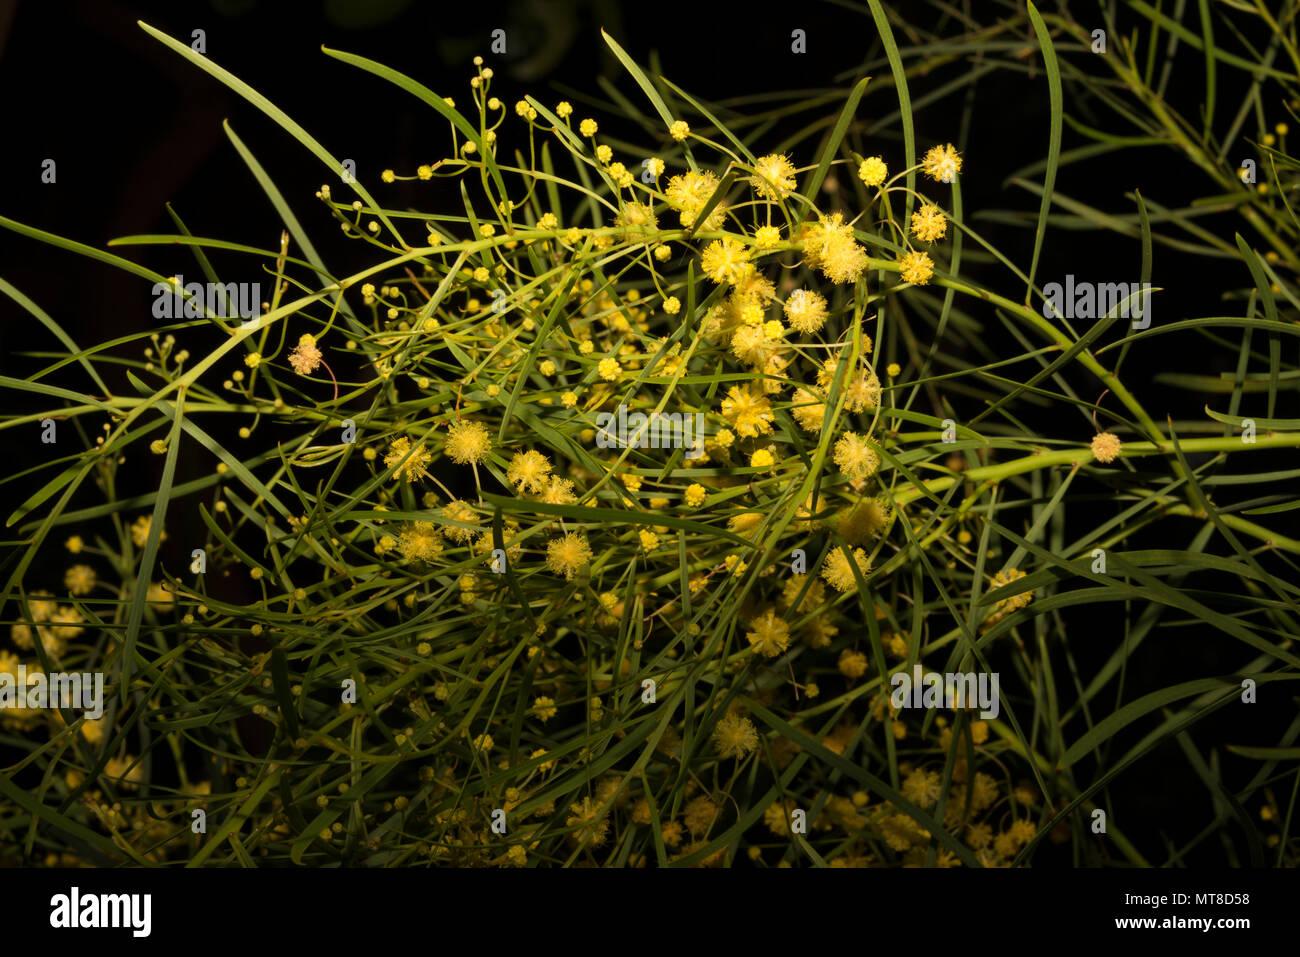 Flinders Range Wattle Acacia Iteaphylla Stock Photo 187041380 Alamy